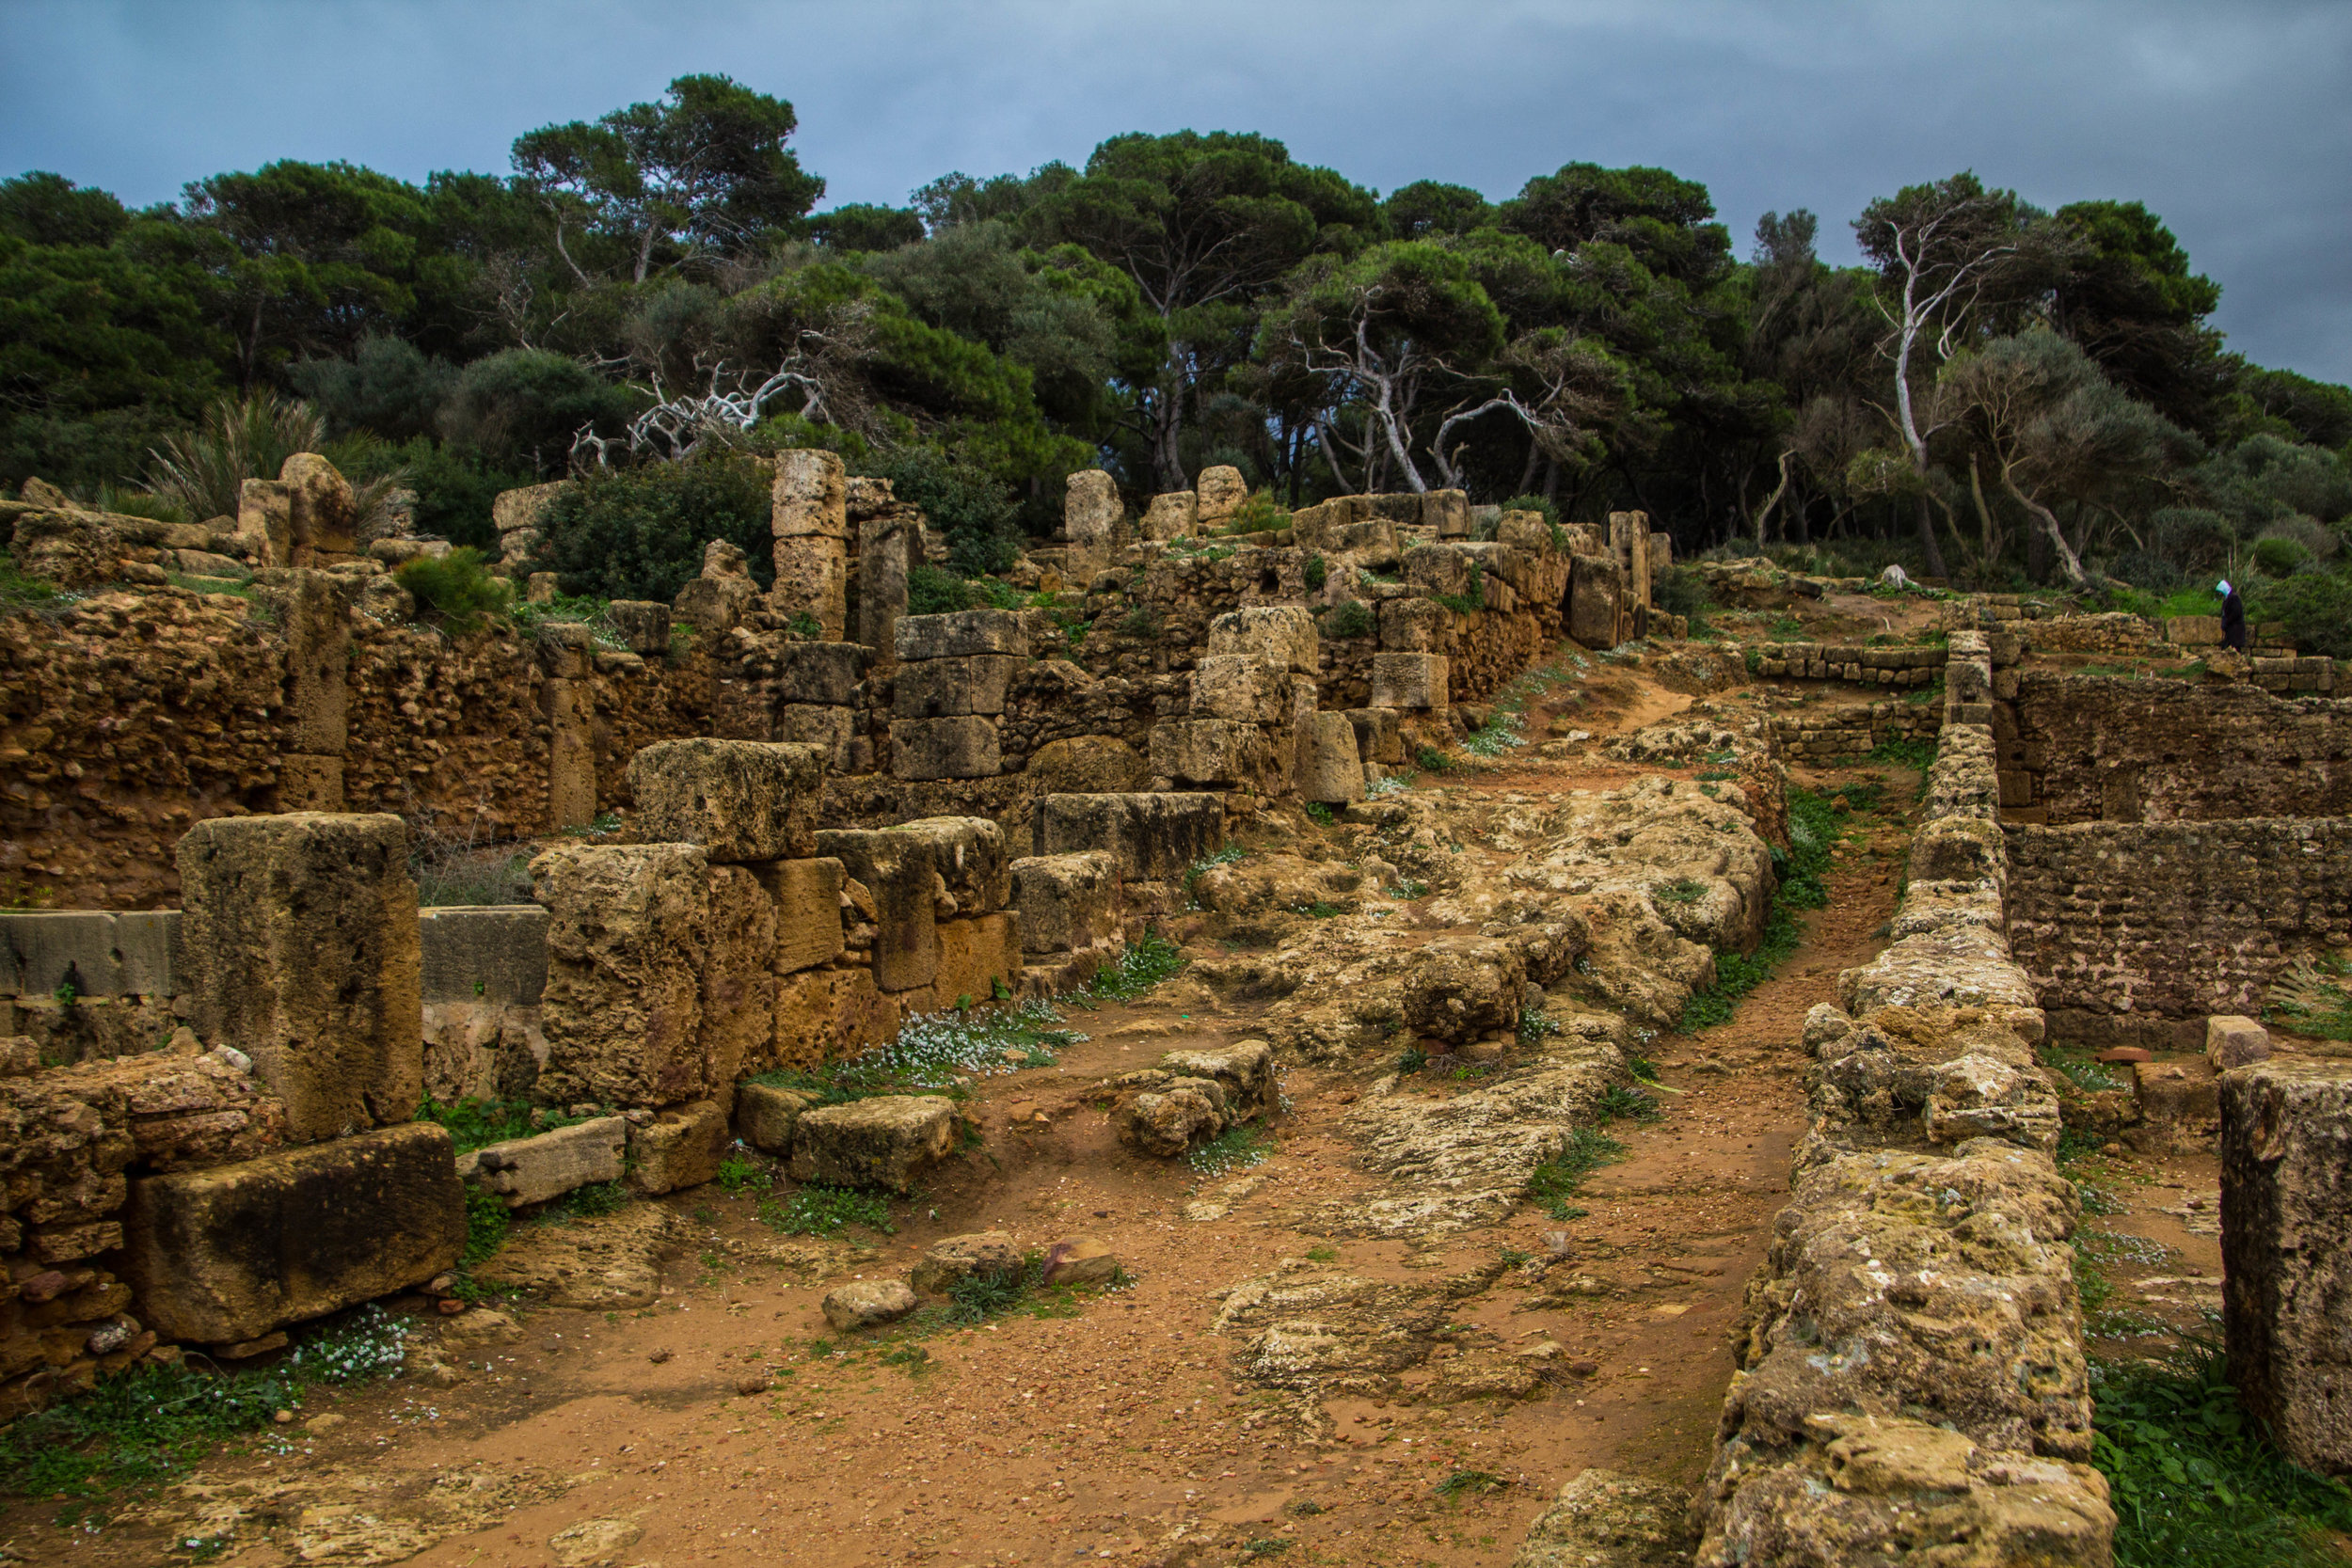 tipiza-roman-ruins-algeria-17.jpg